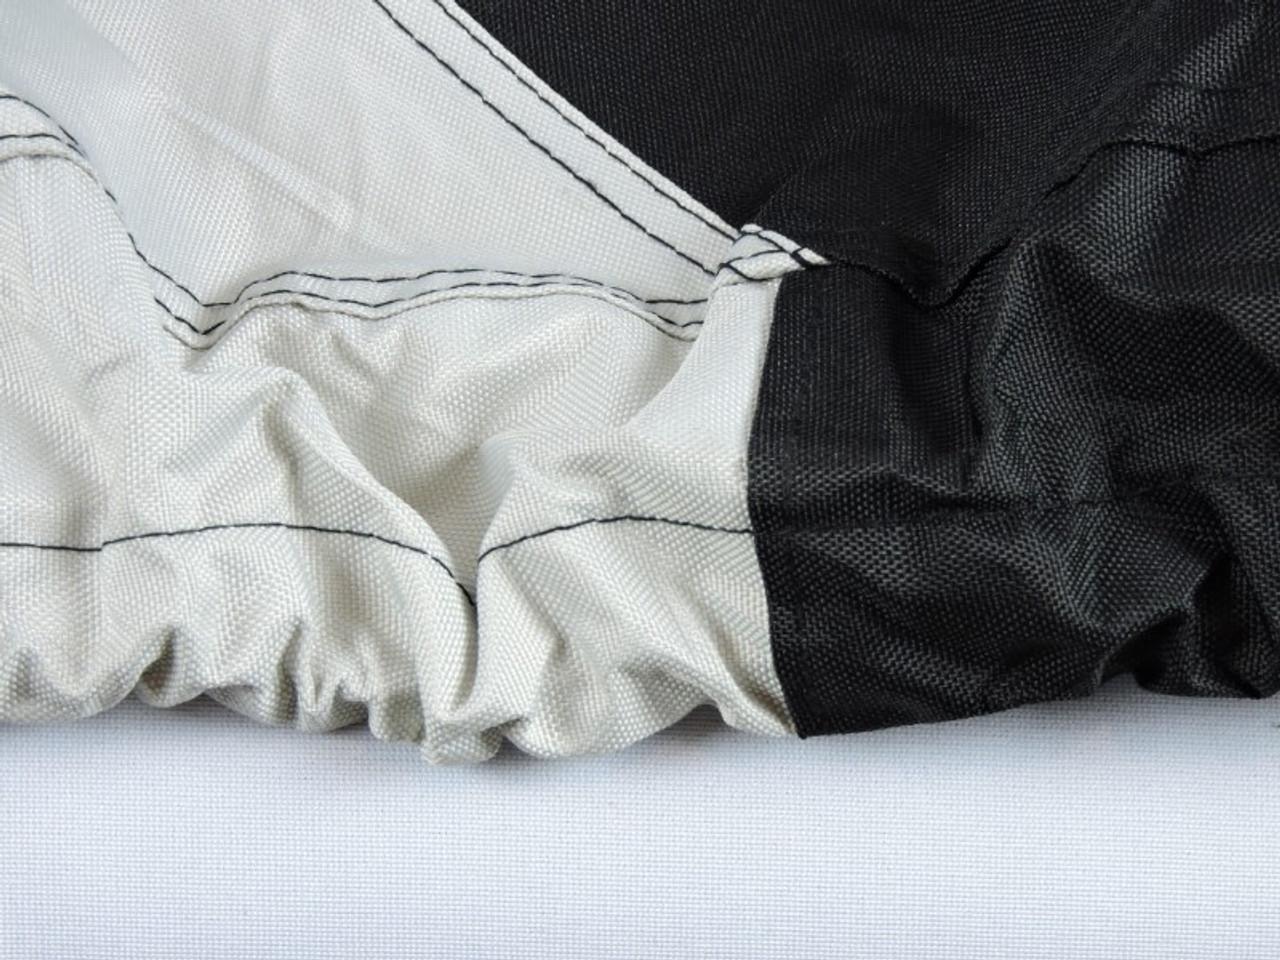 Nanook heavy duty trailering cover tufftex fabric